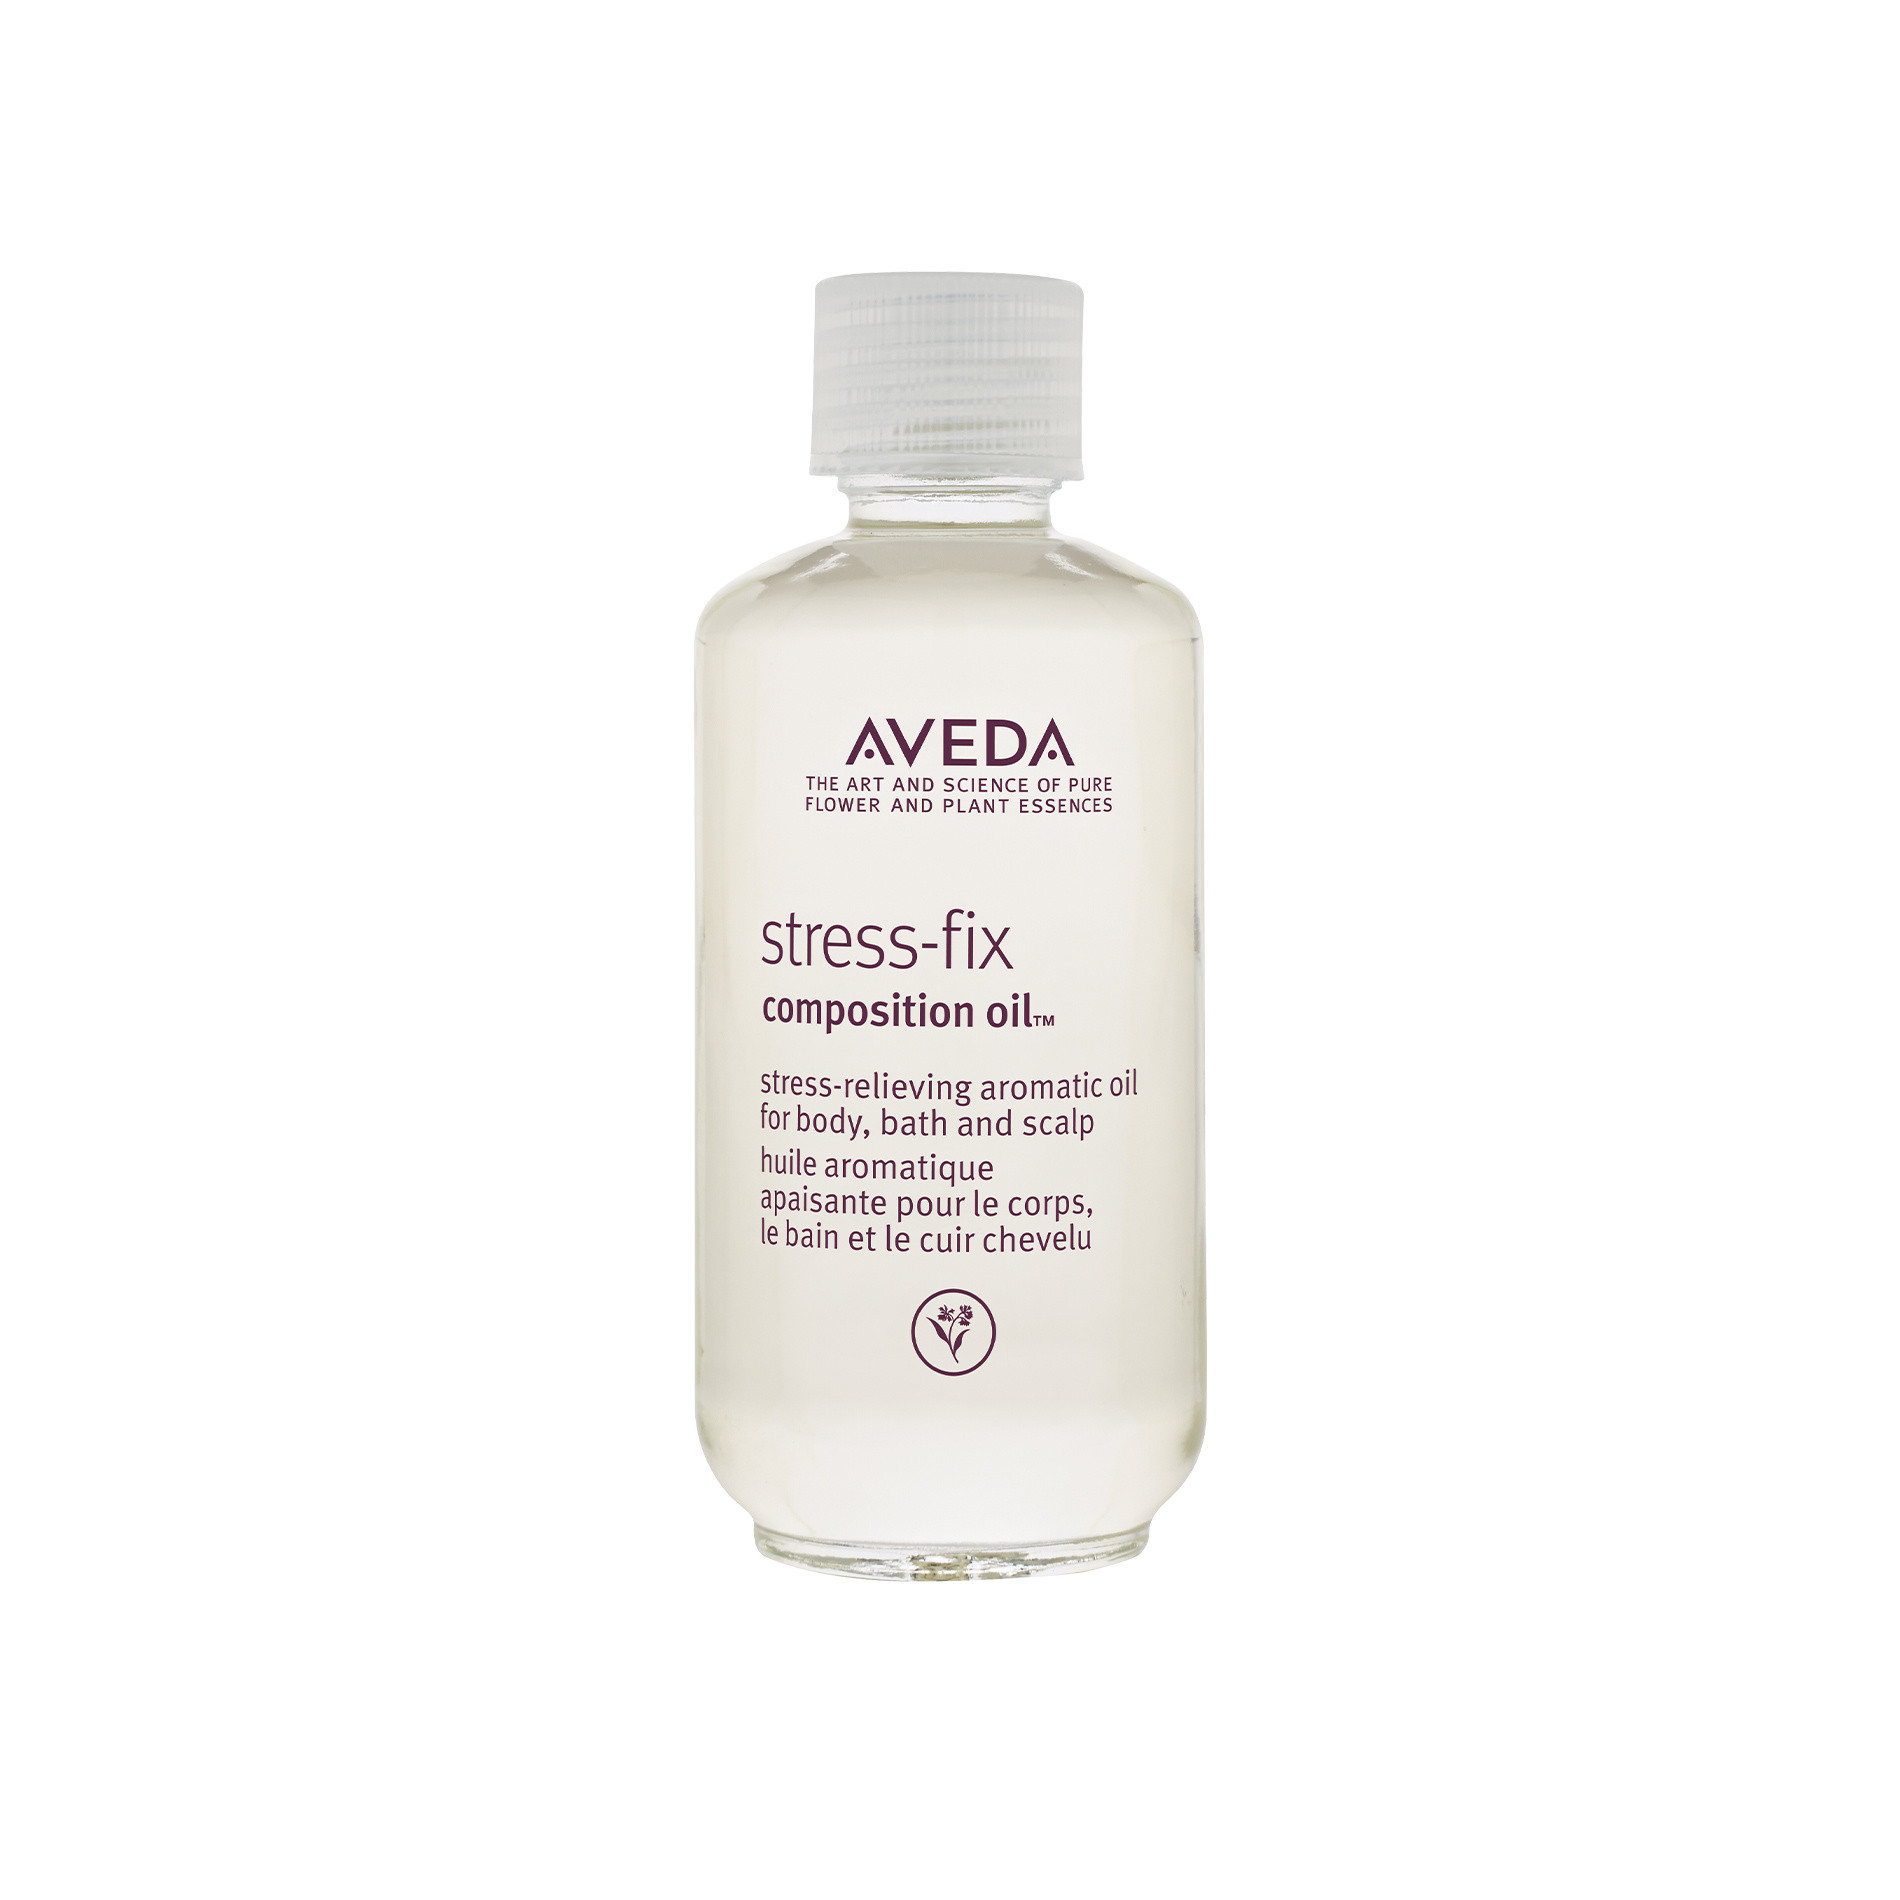 Aveda stress-fix olio multifunzione 50 ml, Viola, large image number 0